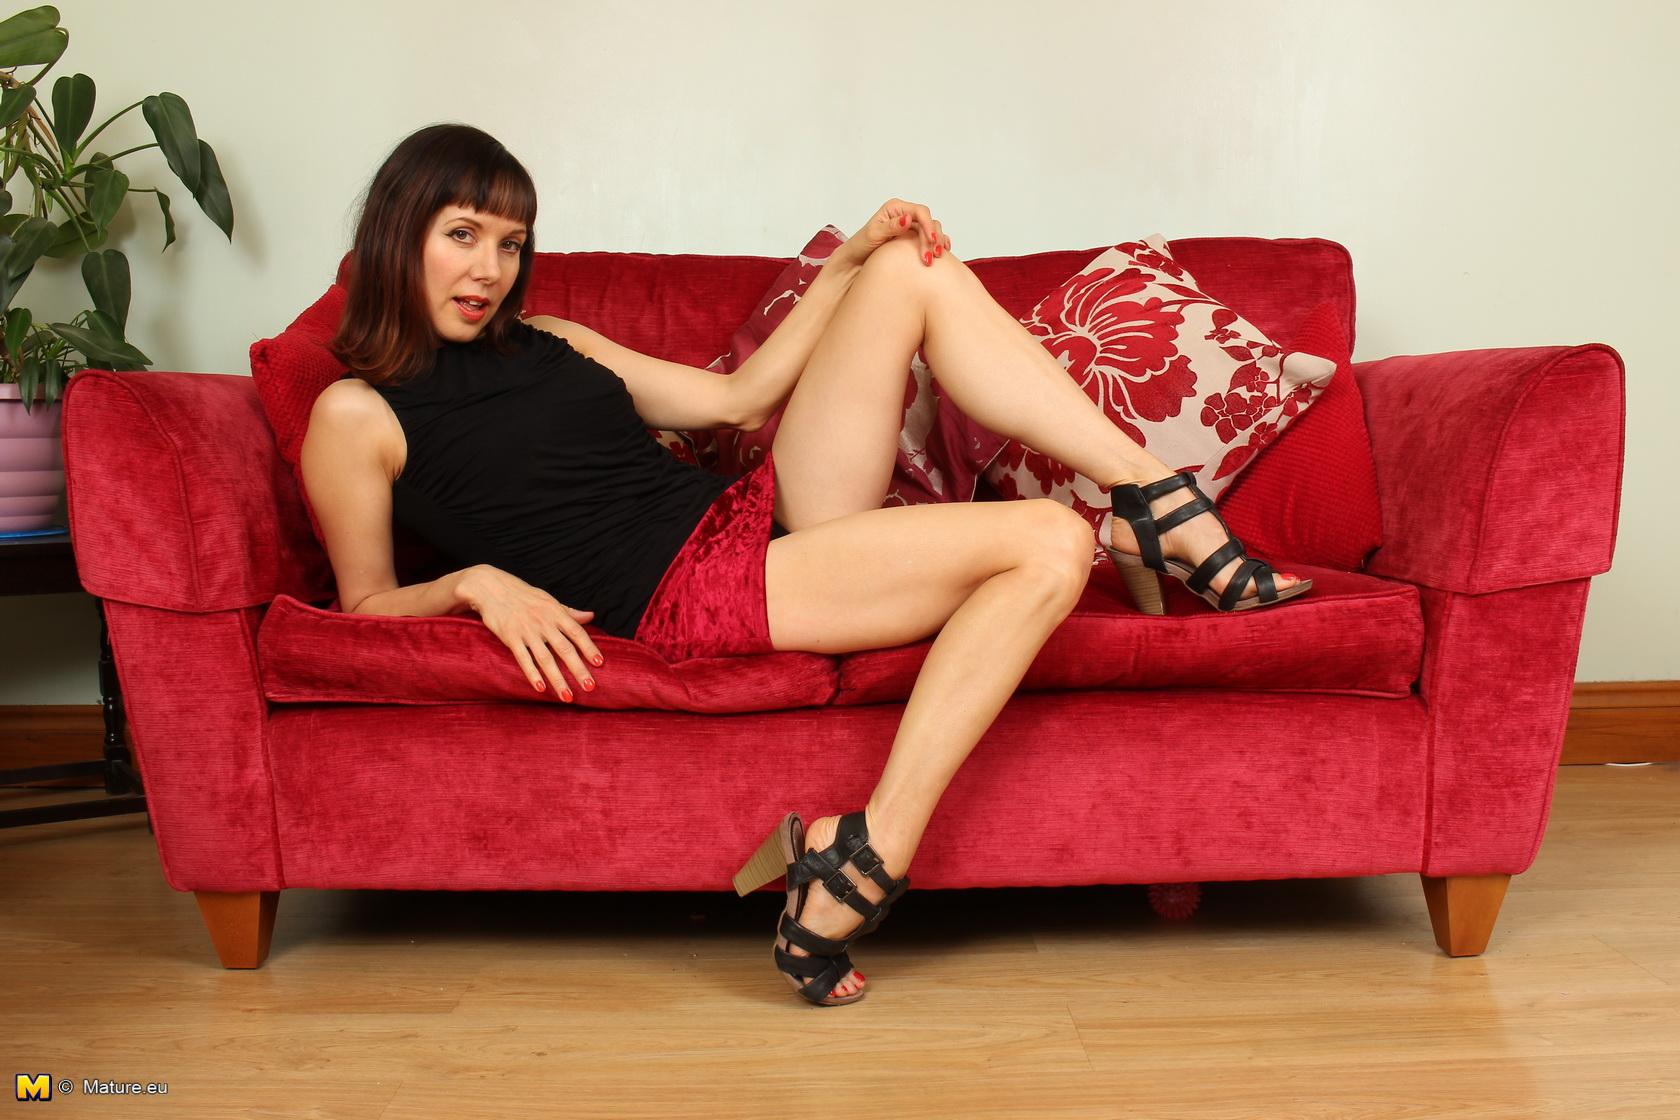 Cute British housewife feeling a bit frisky